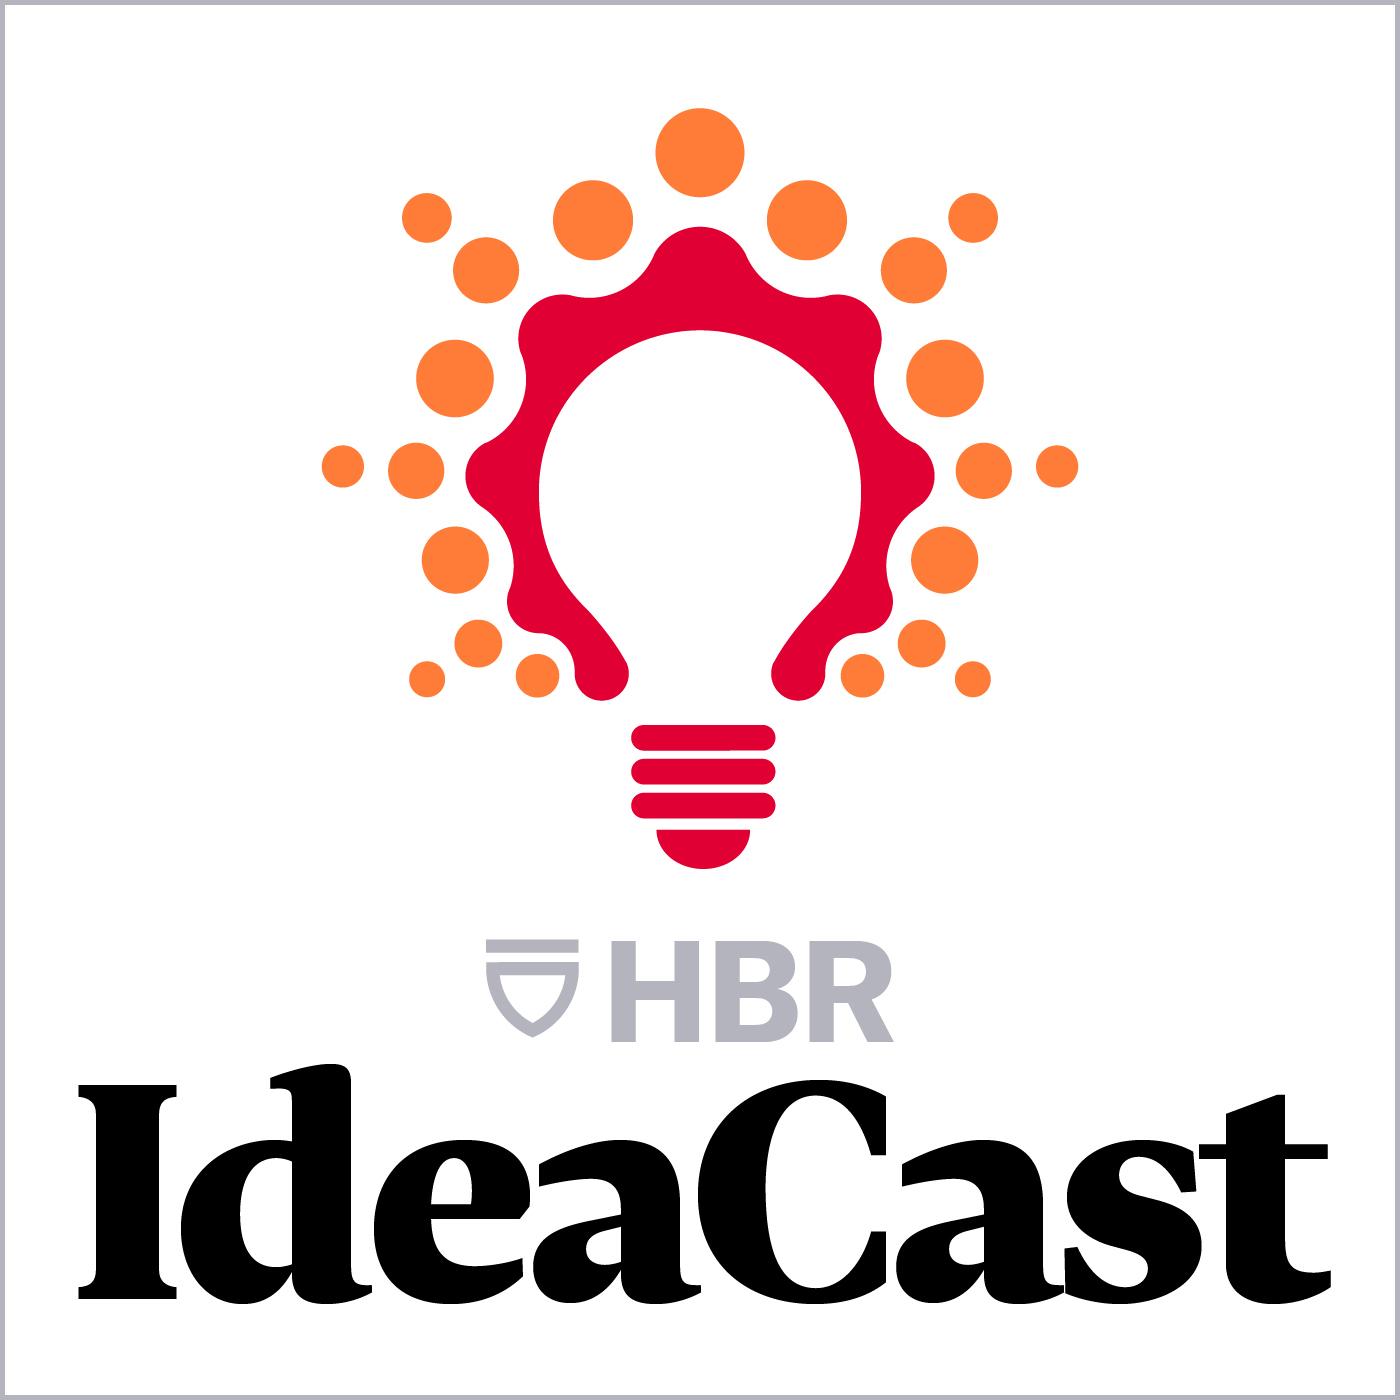 HBR Idea Podcast